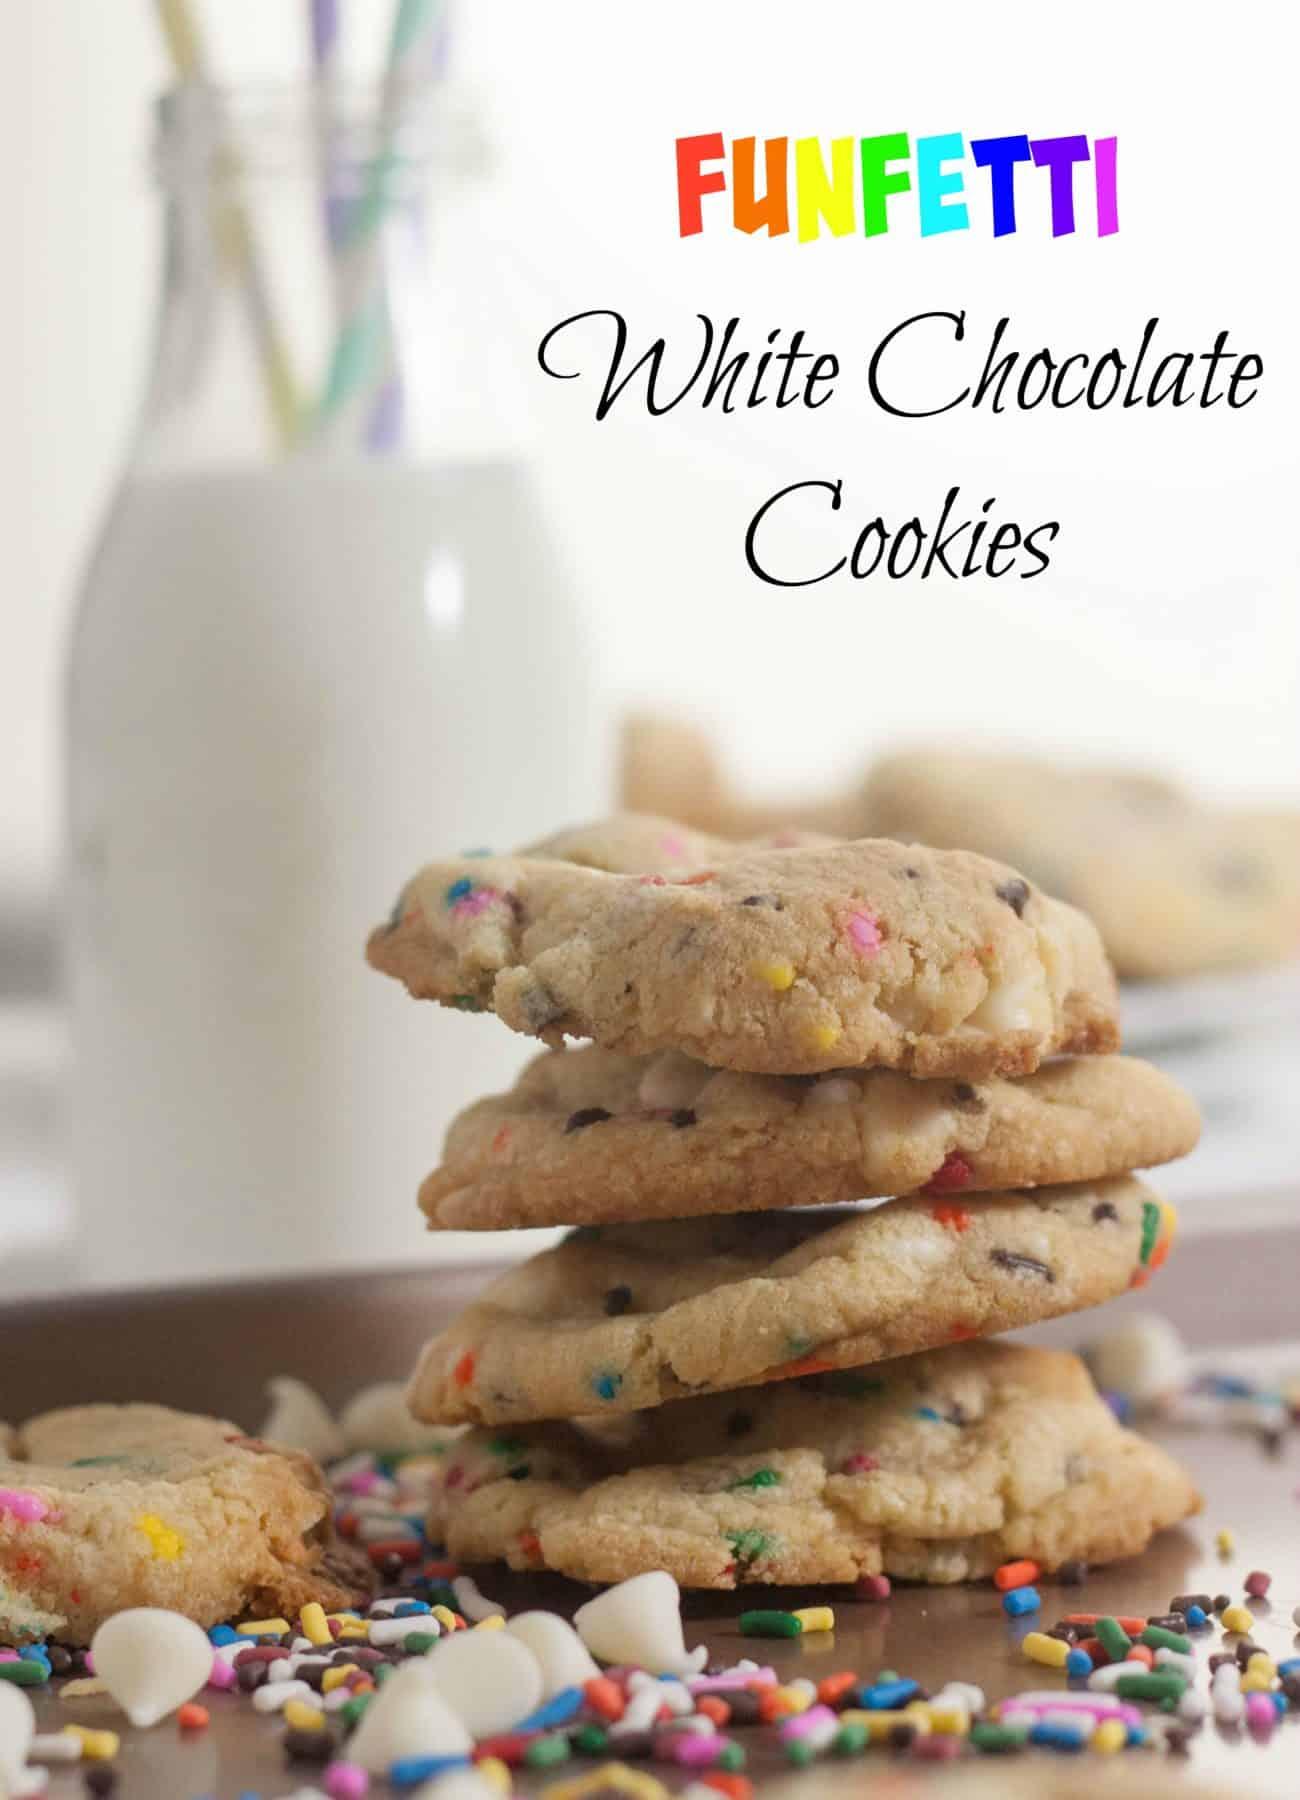 Funfetti White Chocolate Chip Cookies